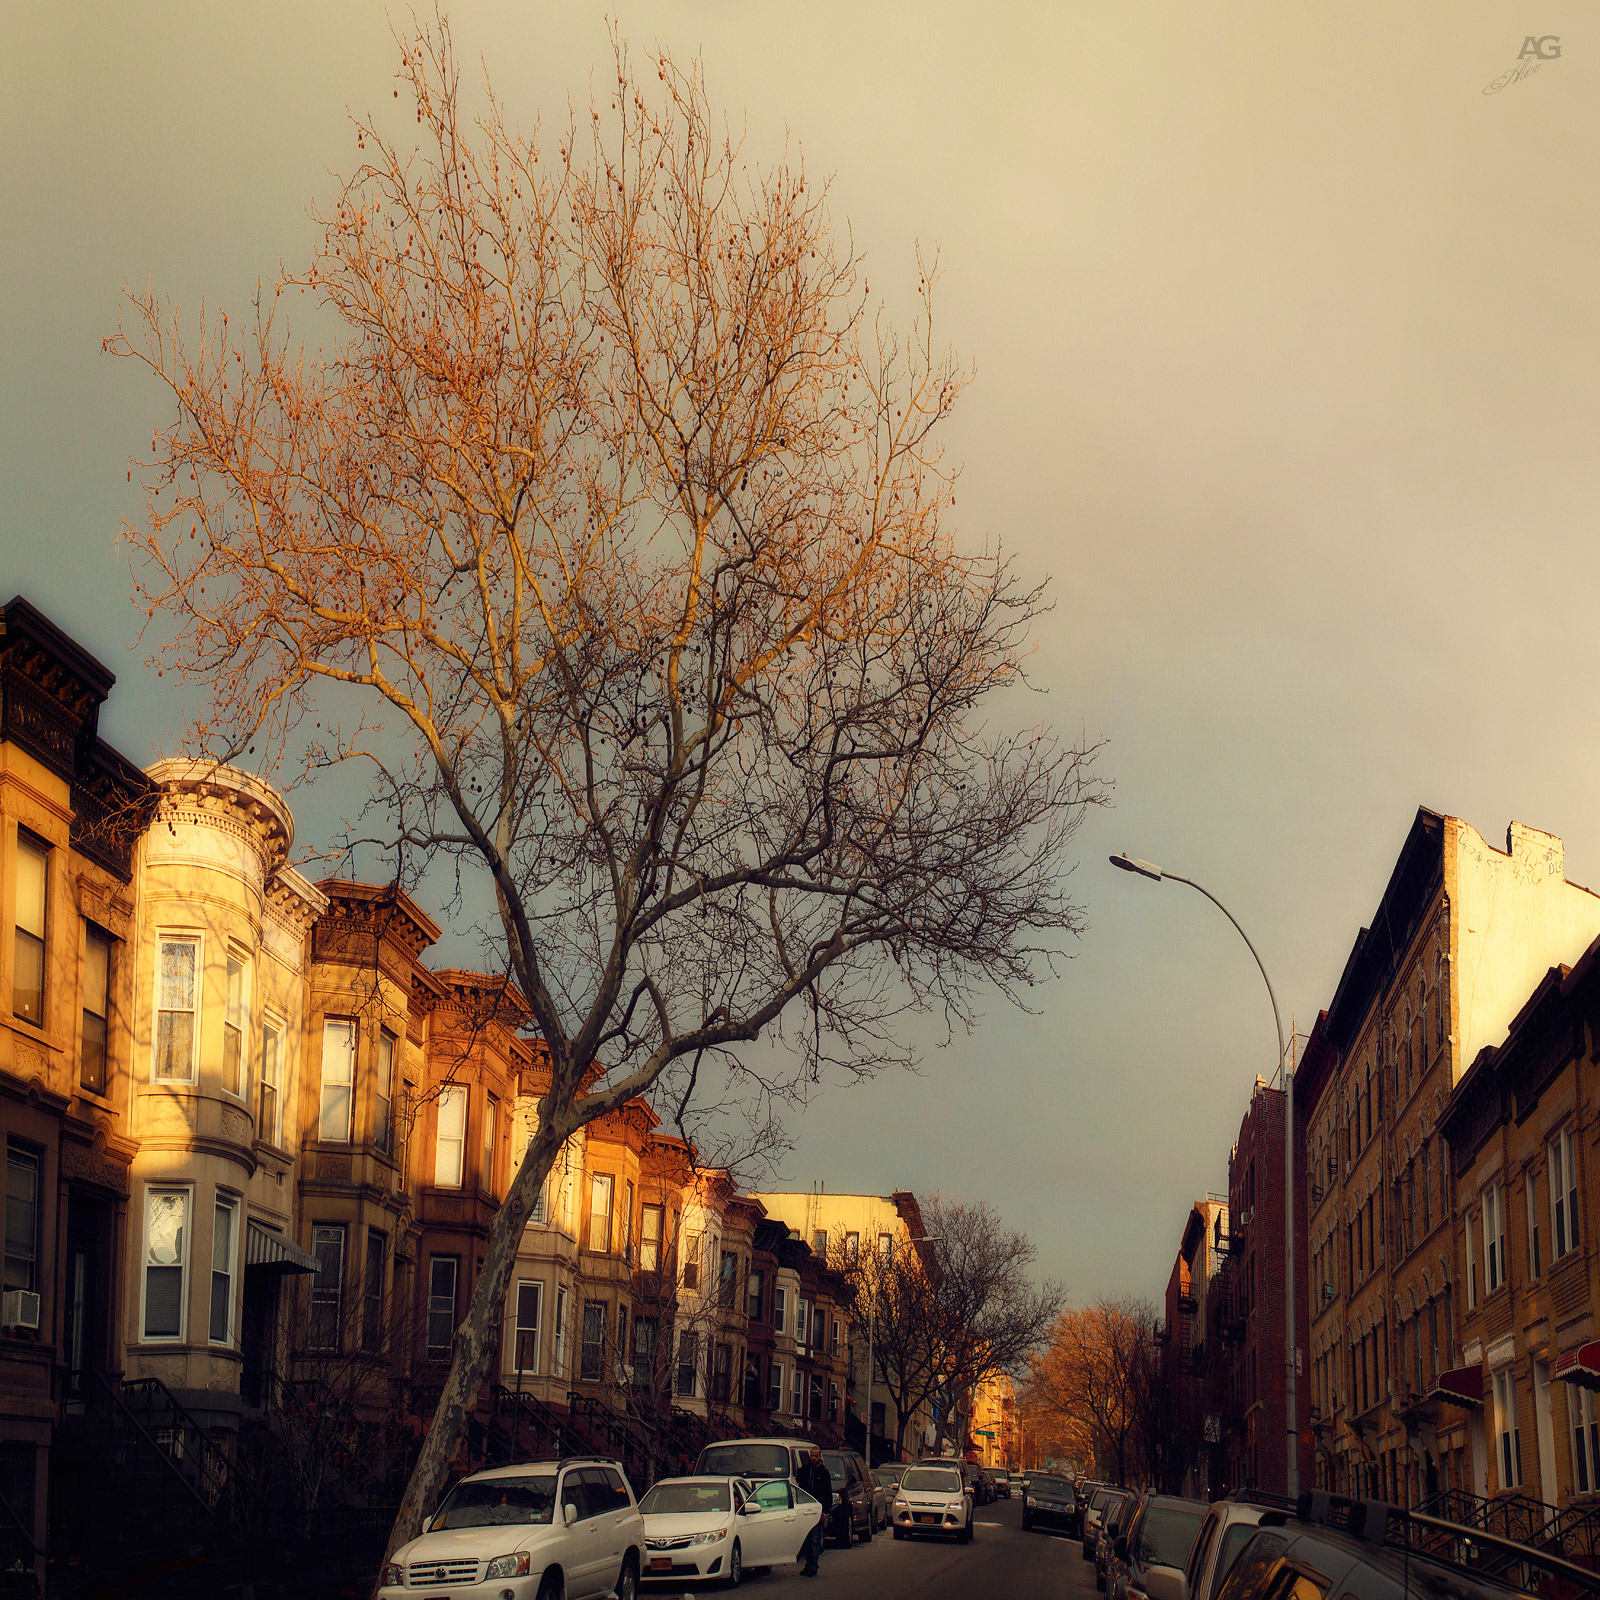 BrooklynSunsetParkAreaStreetTallGoldenHour_squished_1600